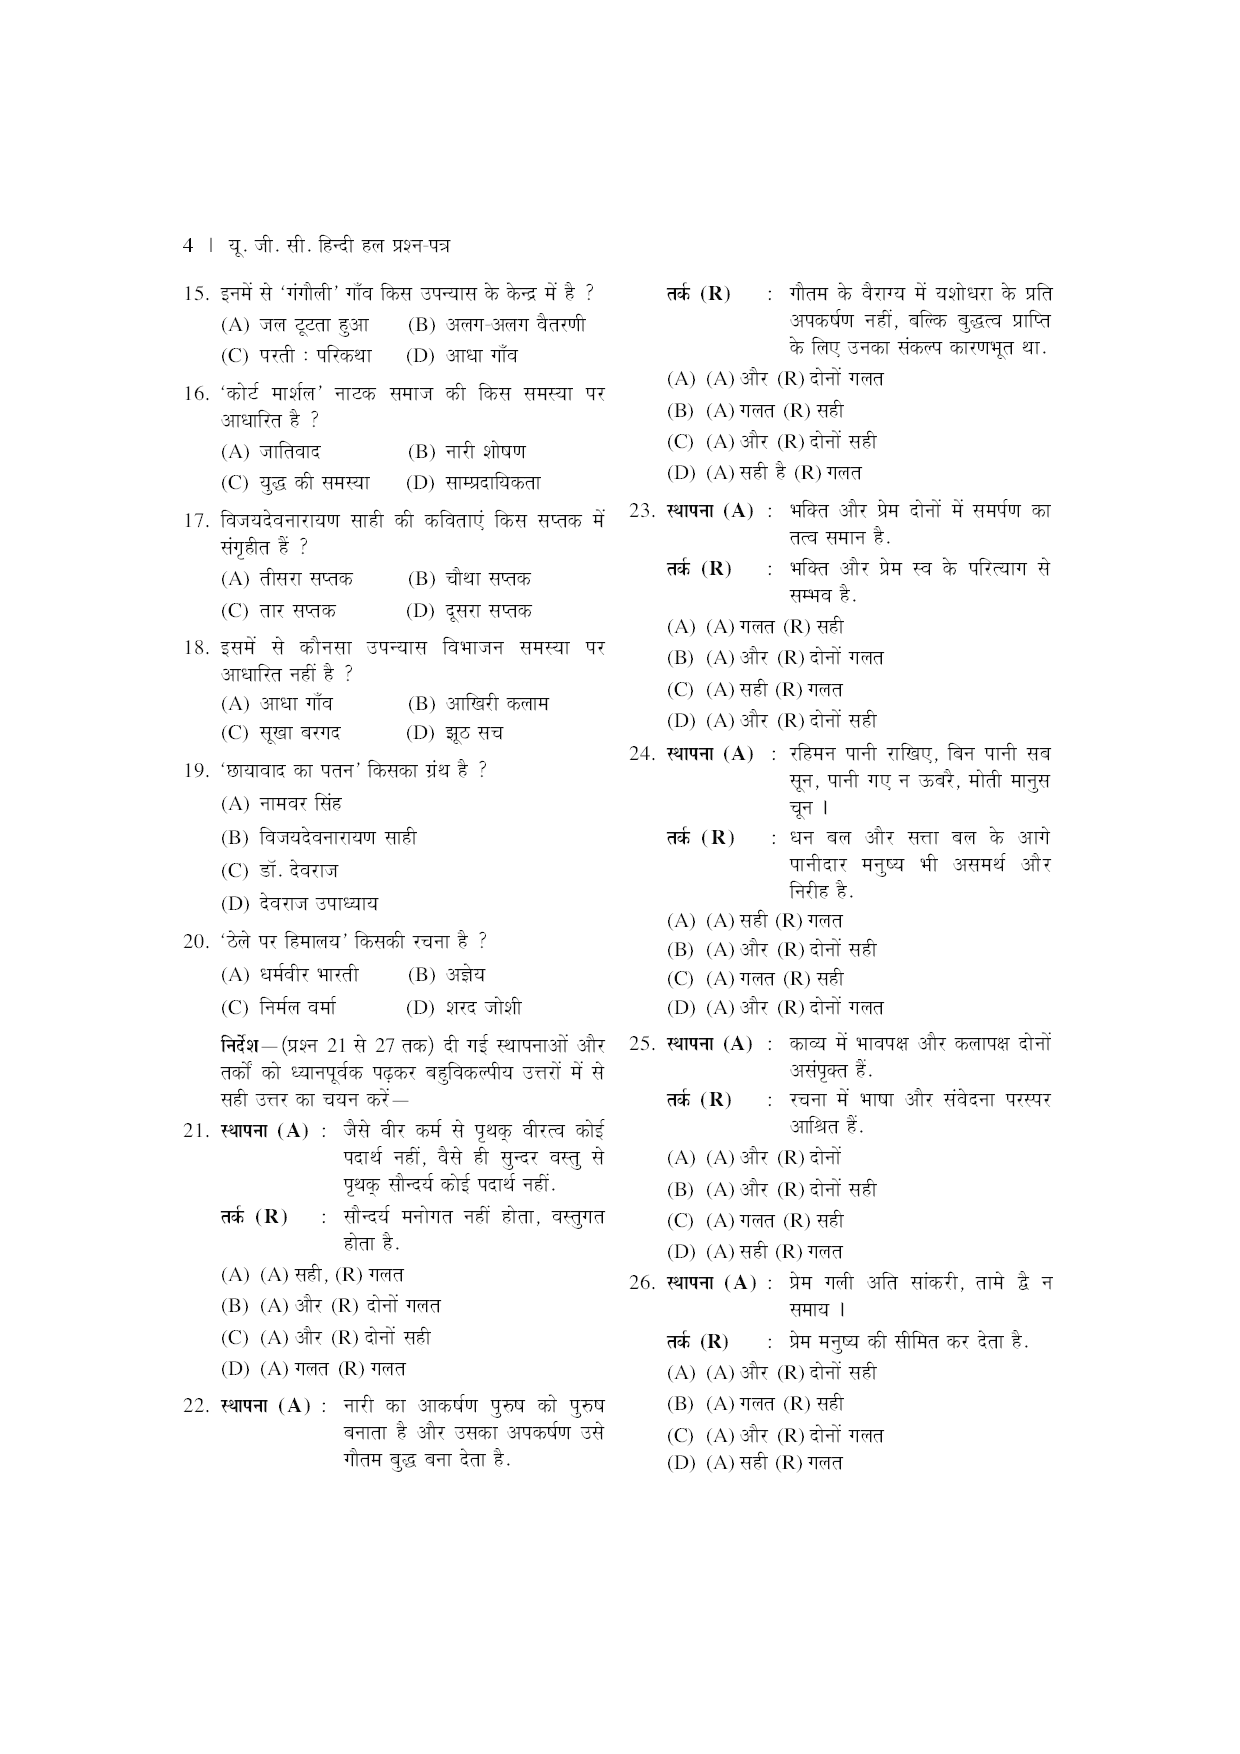 U.G.C. NET/J.R.F. परीक्षा साल्व्ड पेपर हिंदी   - Page 5